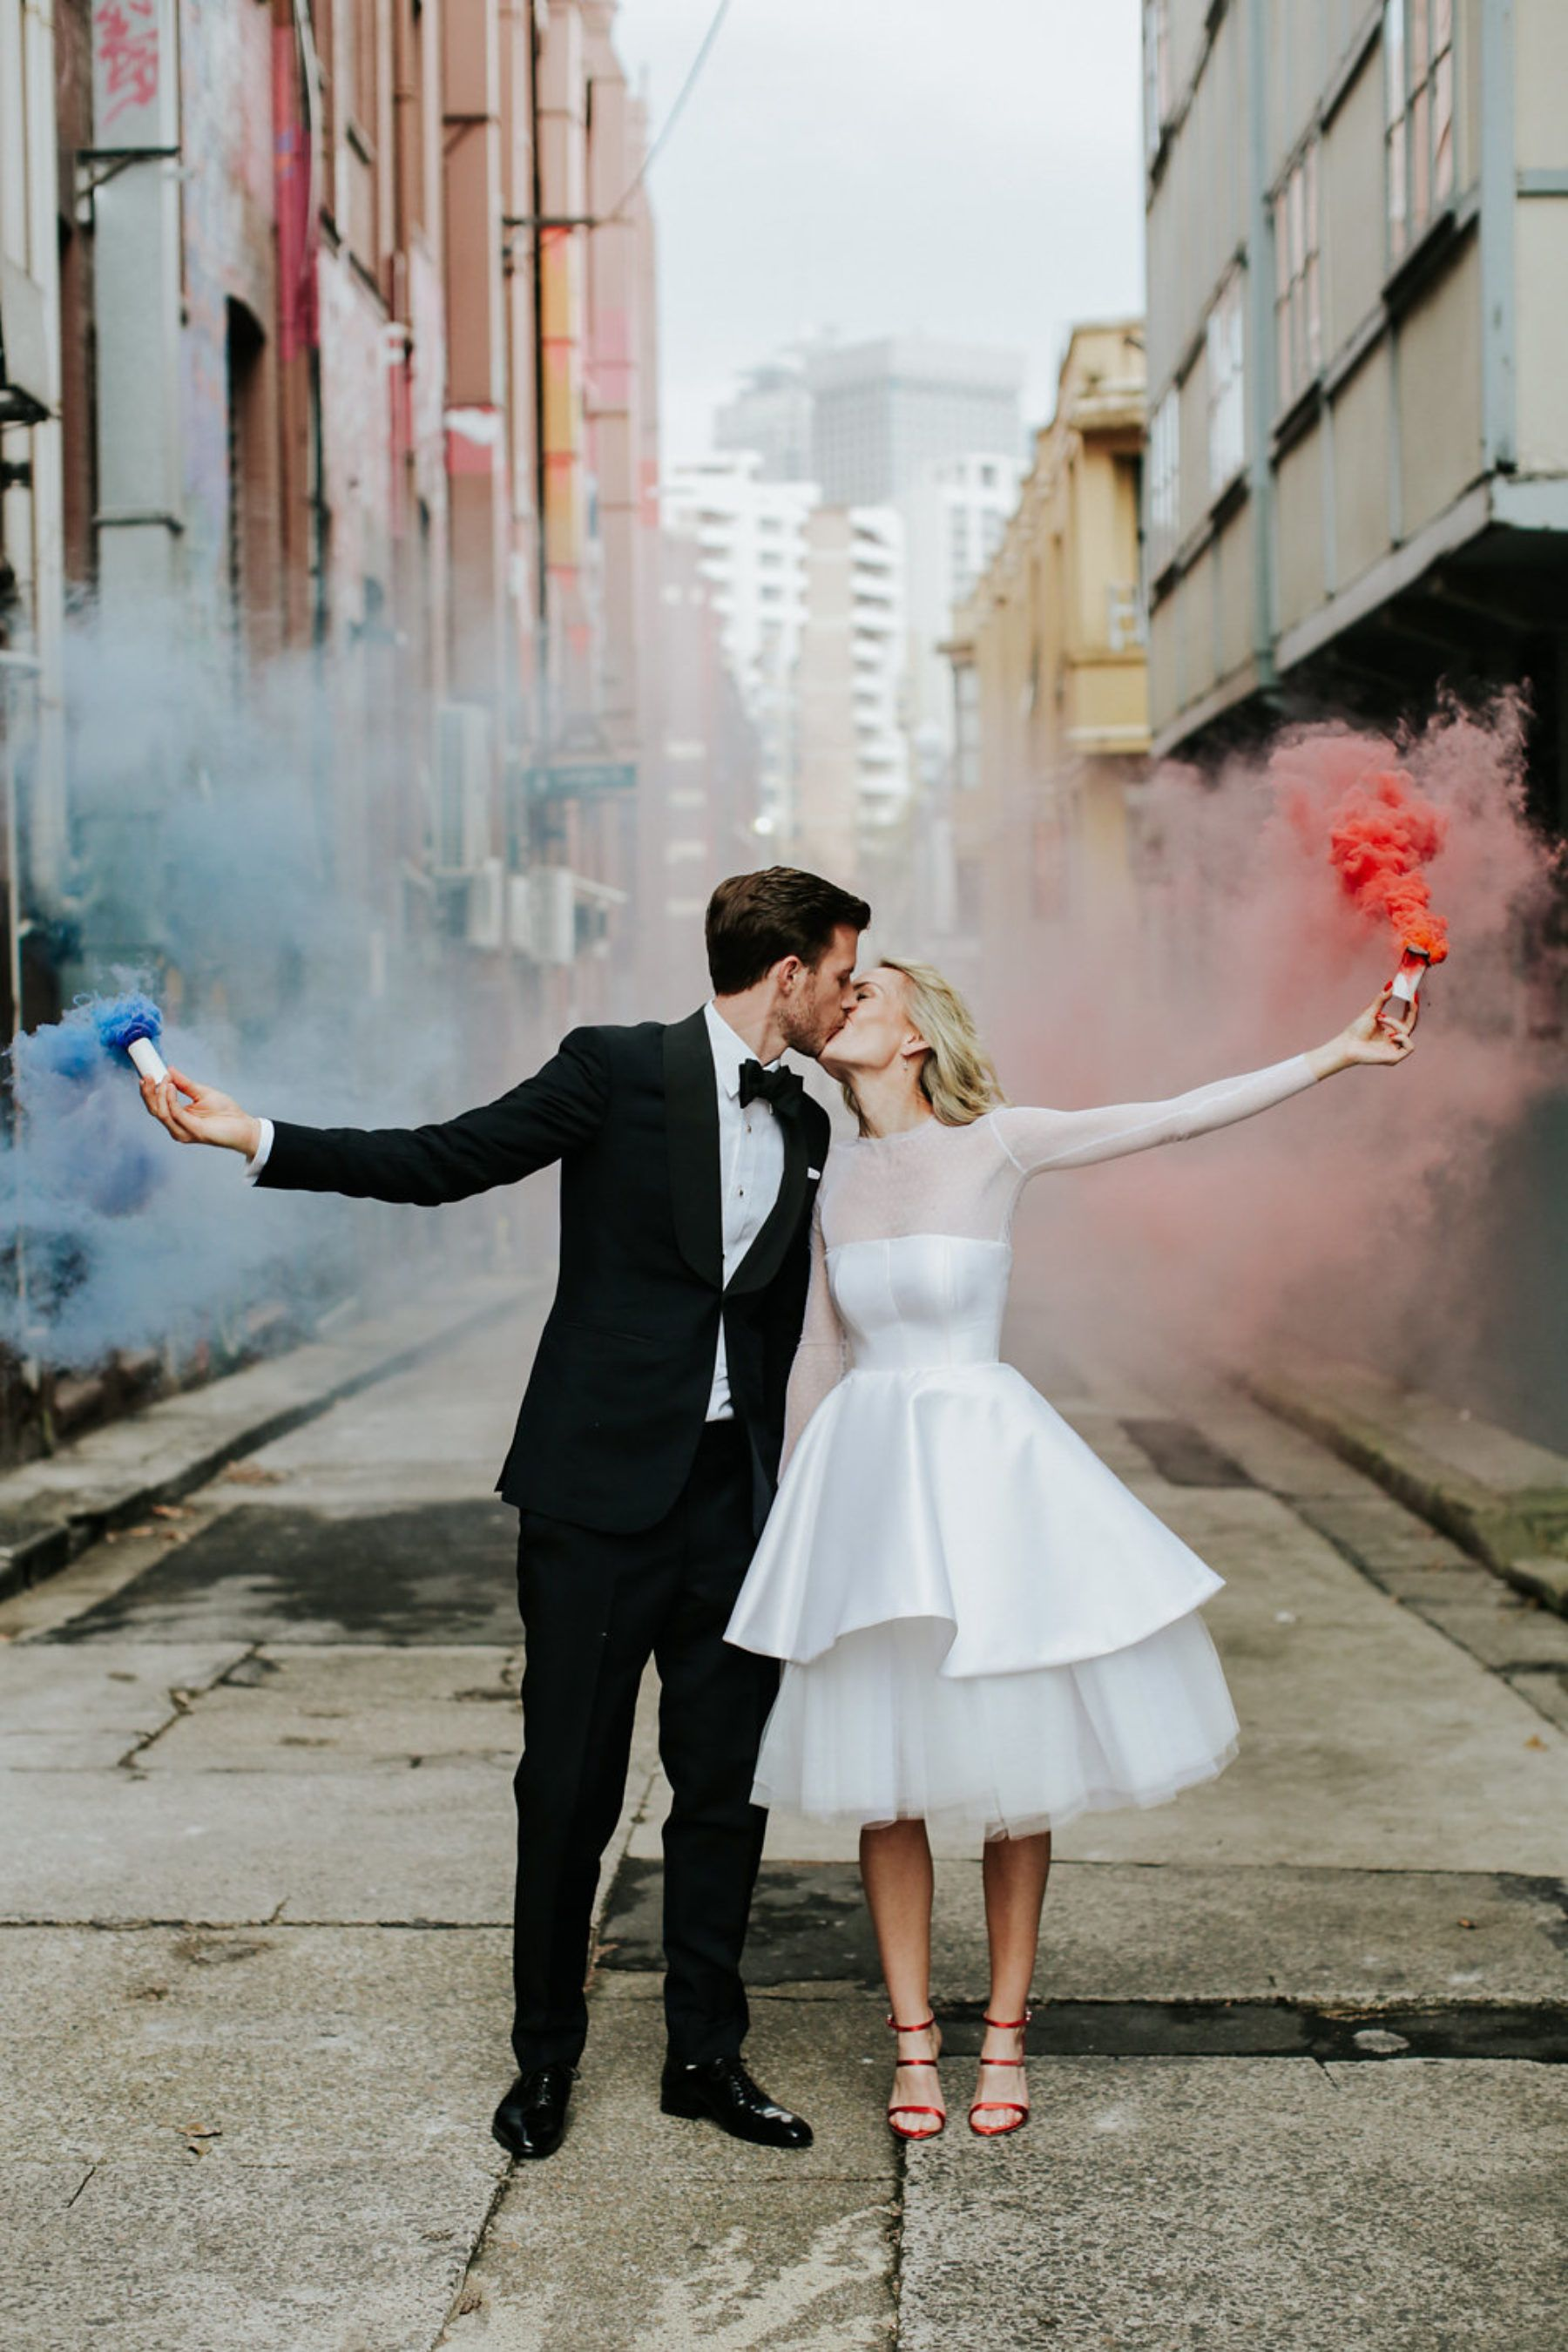 Pin by annika on bridesmaid ideas pinterest wedding and weddings